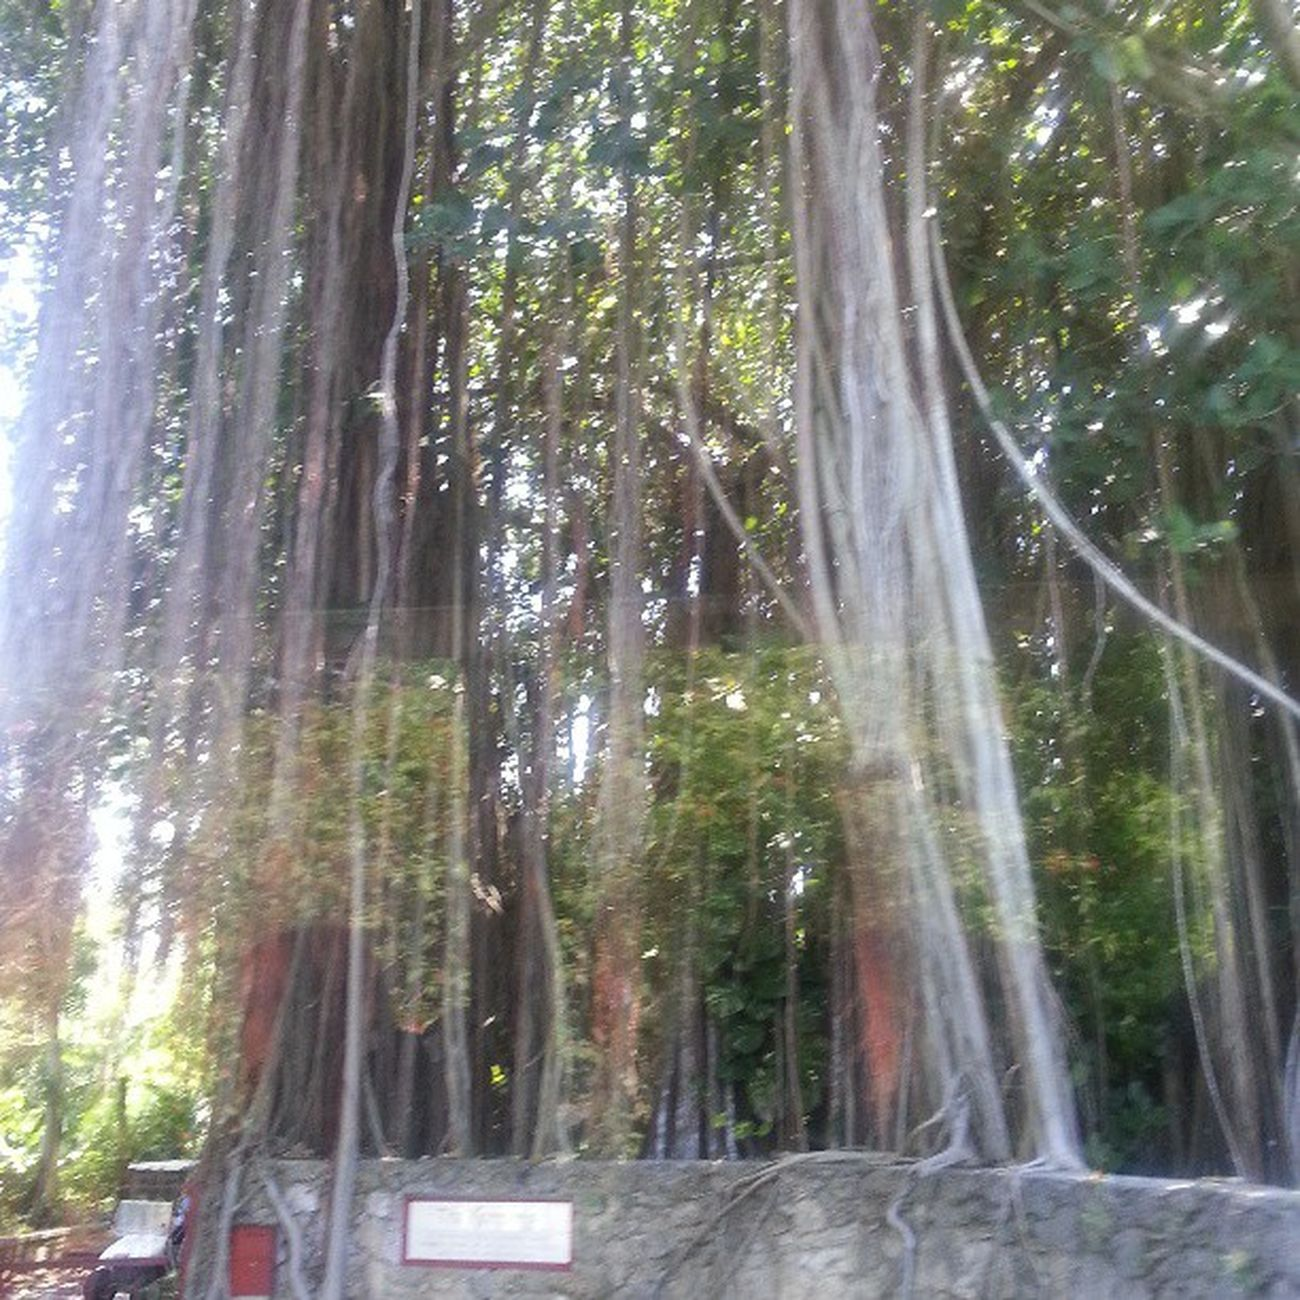 TheKampong CoconutGrove